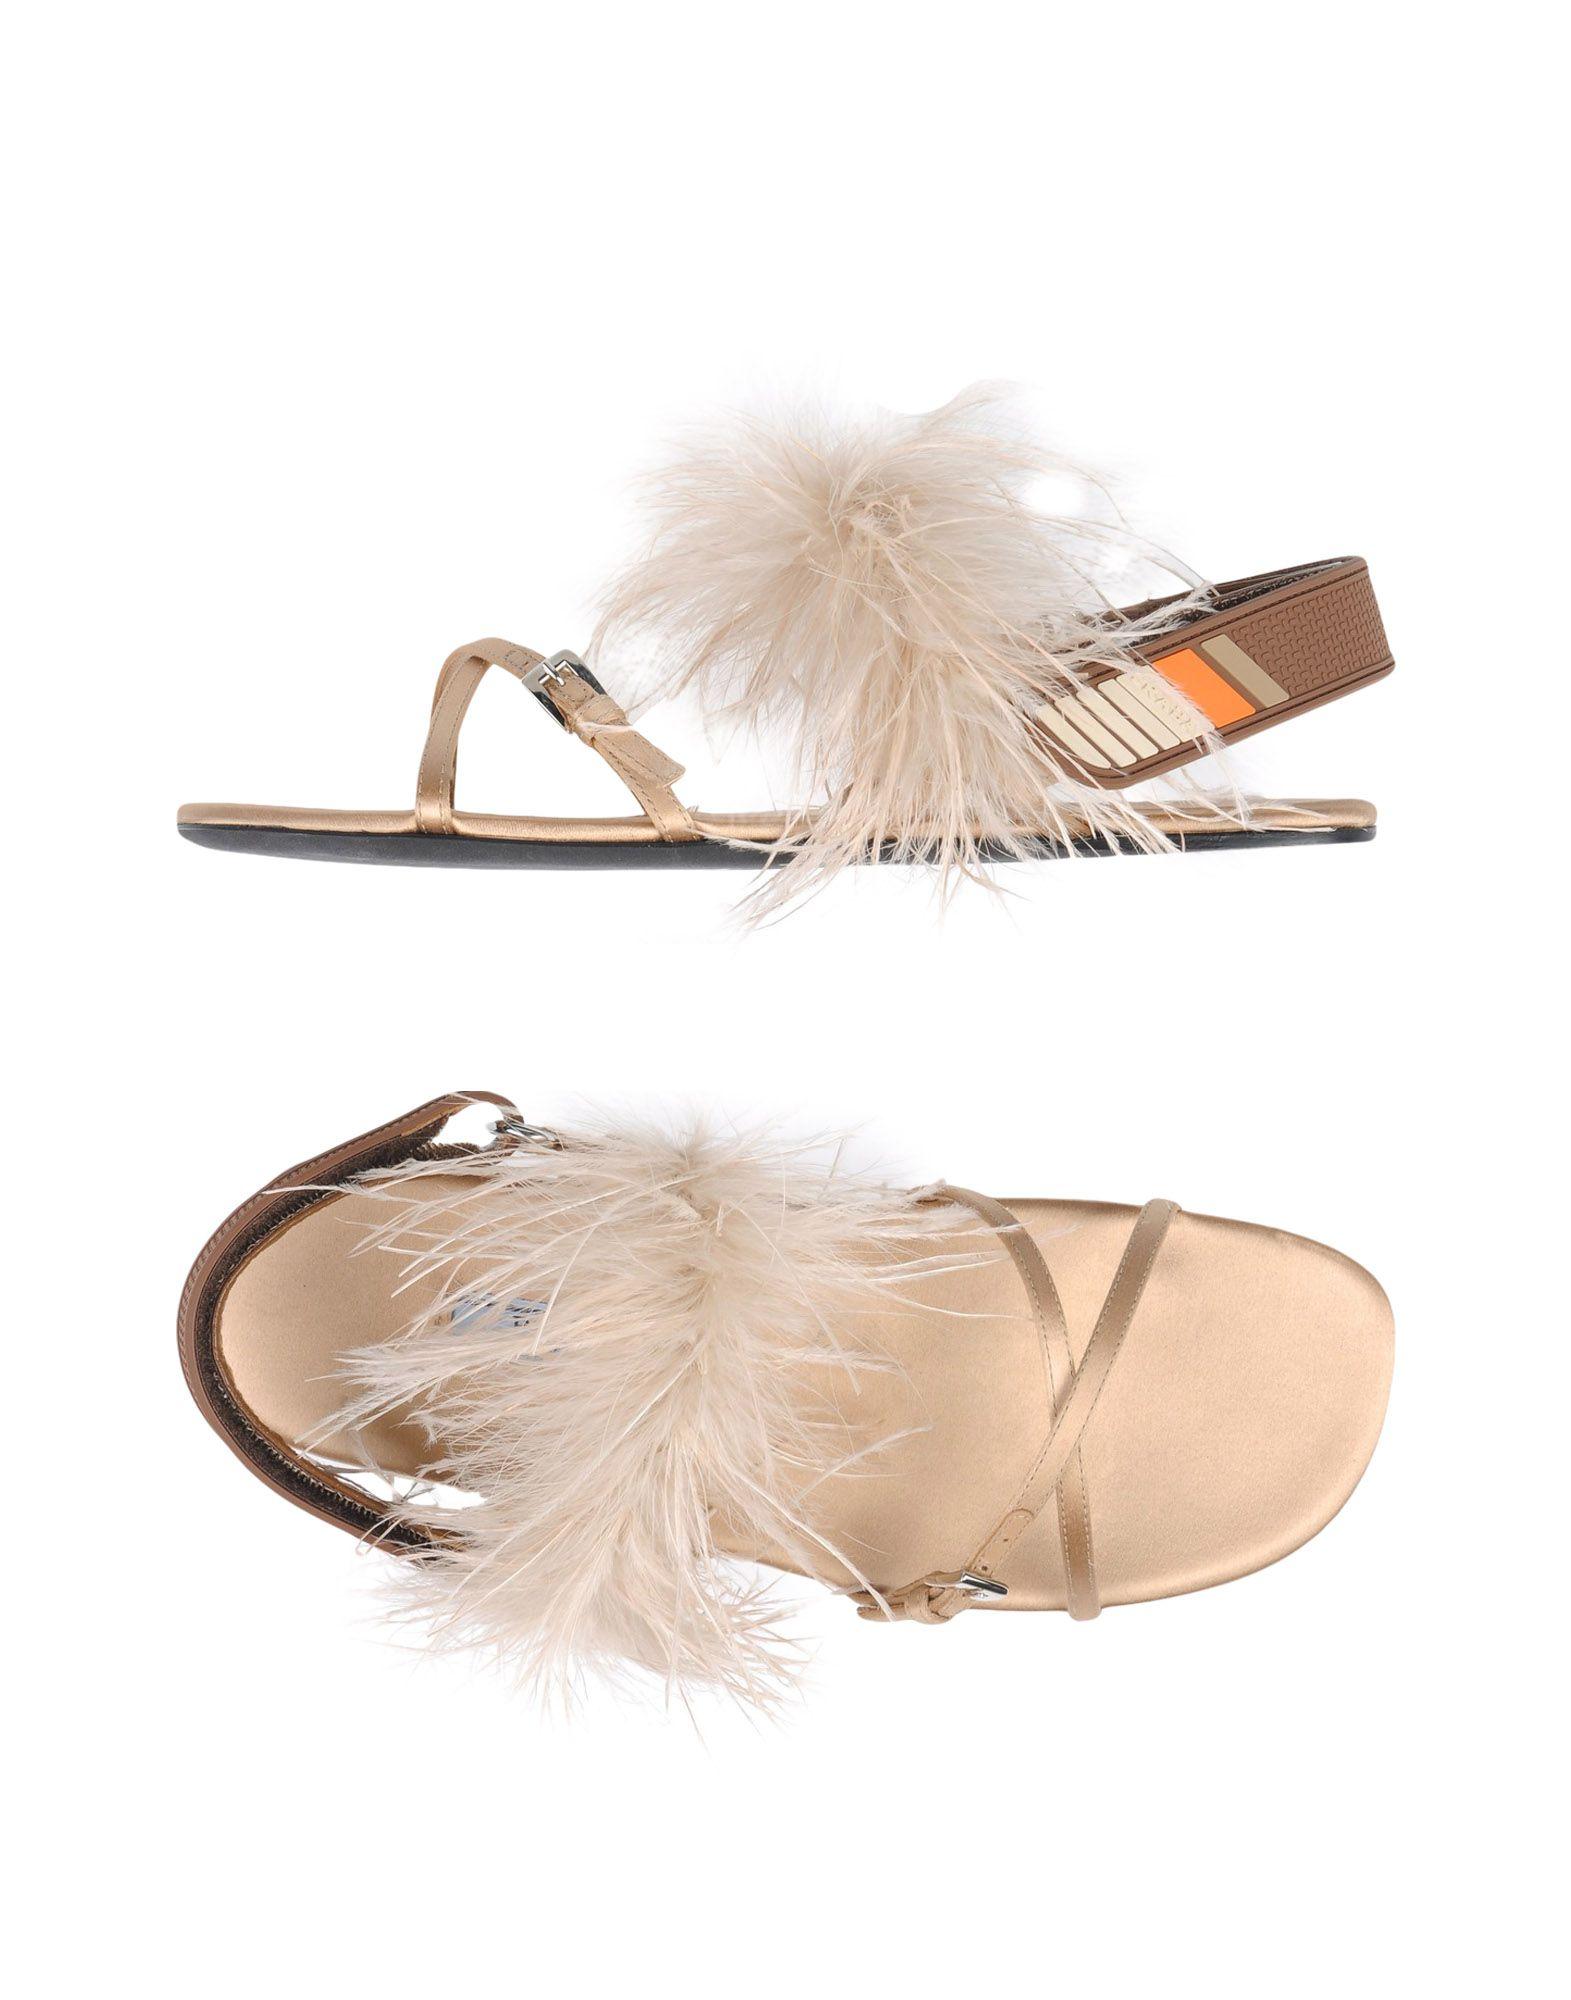 Haltbare Mode billige Schuhe Prada Sandalen Damen  11340428SO Heiße Schuhe